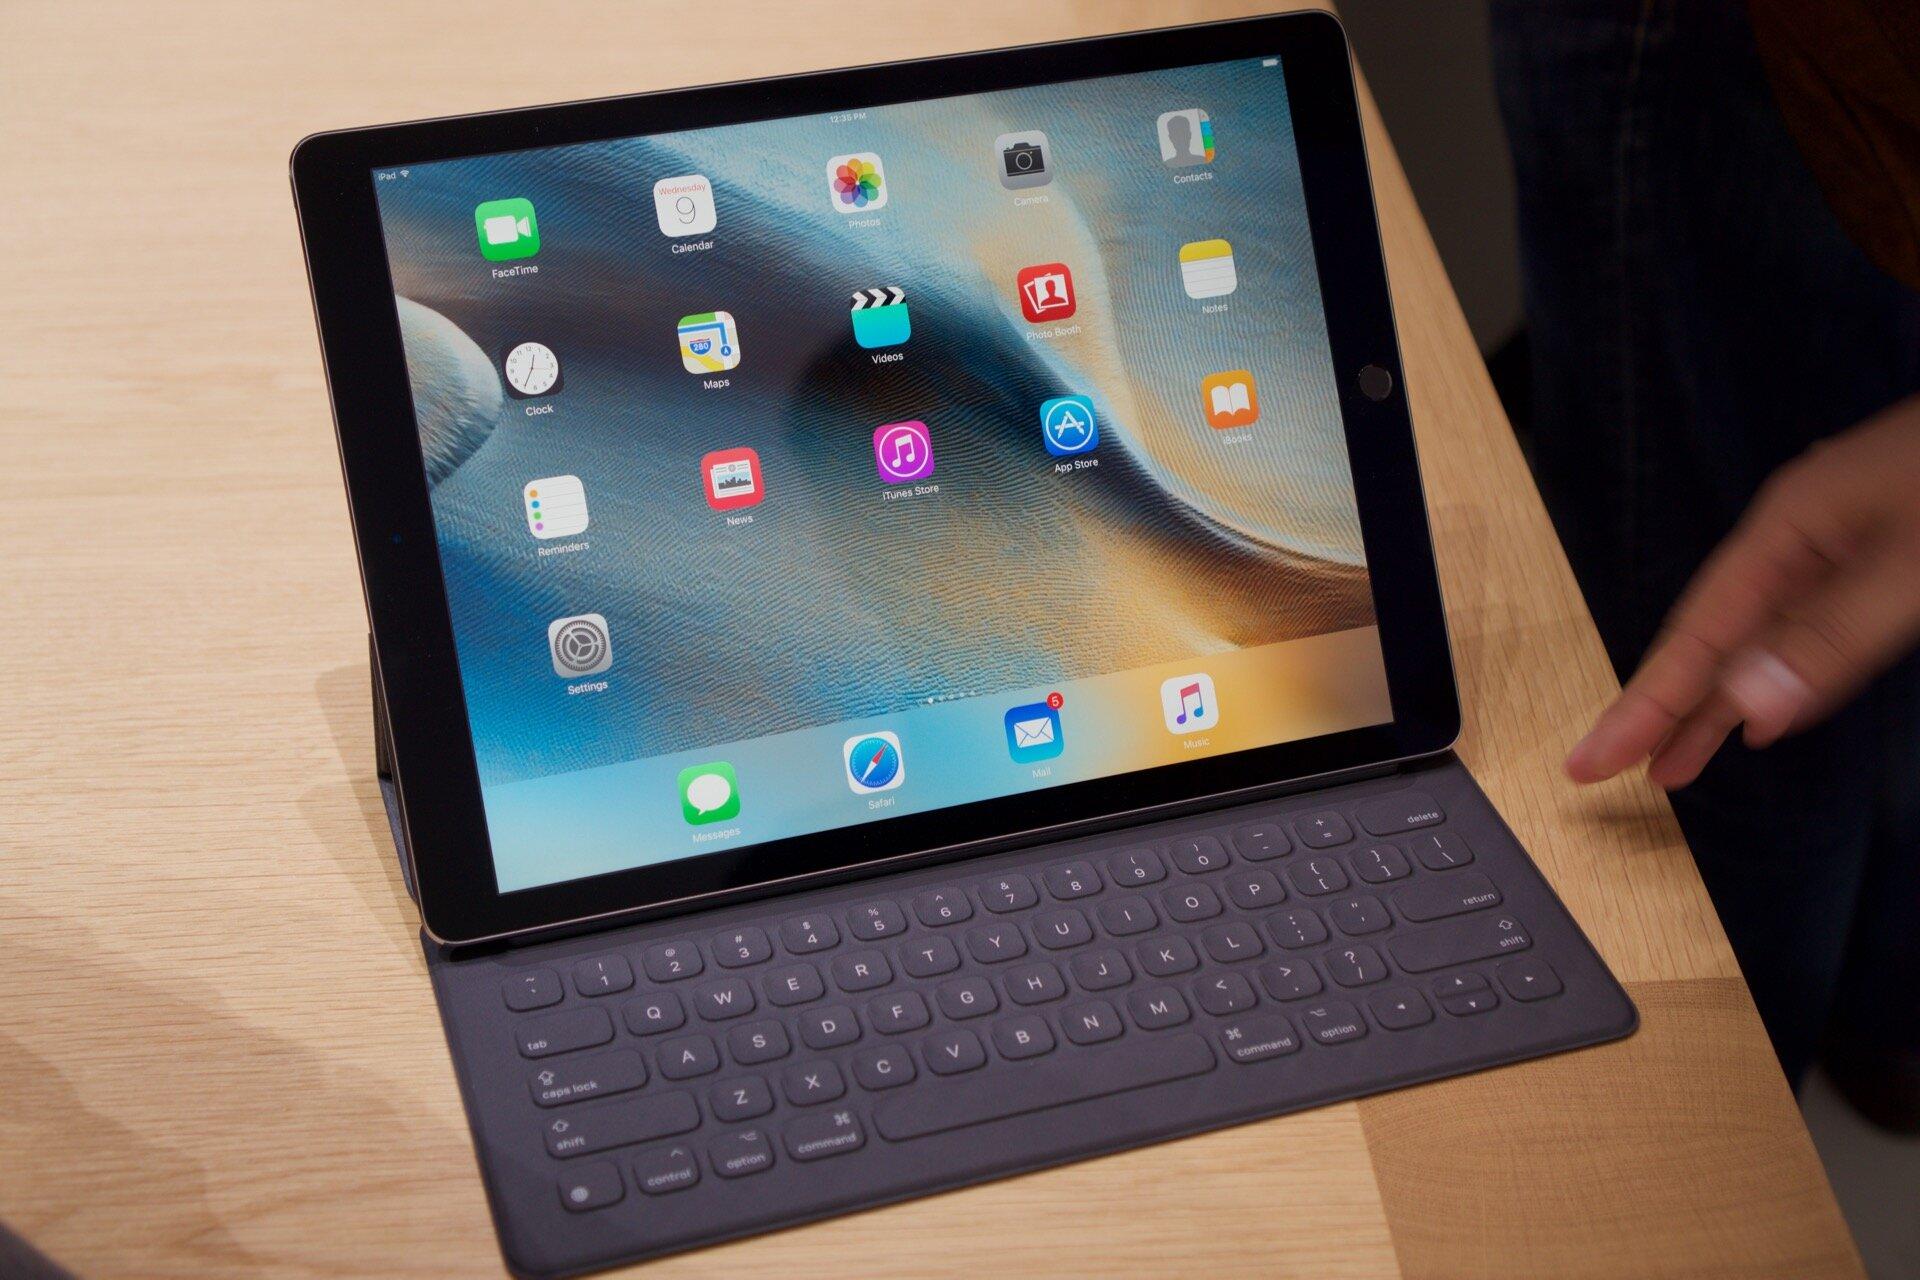 Apple iPad Pro phiên bản 9.7 inch màu đen